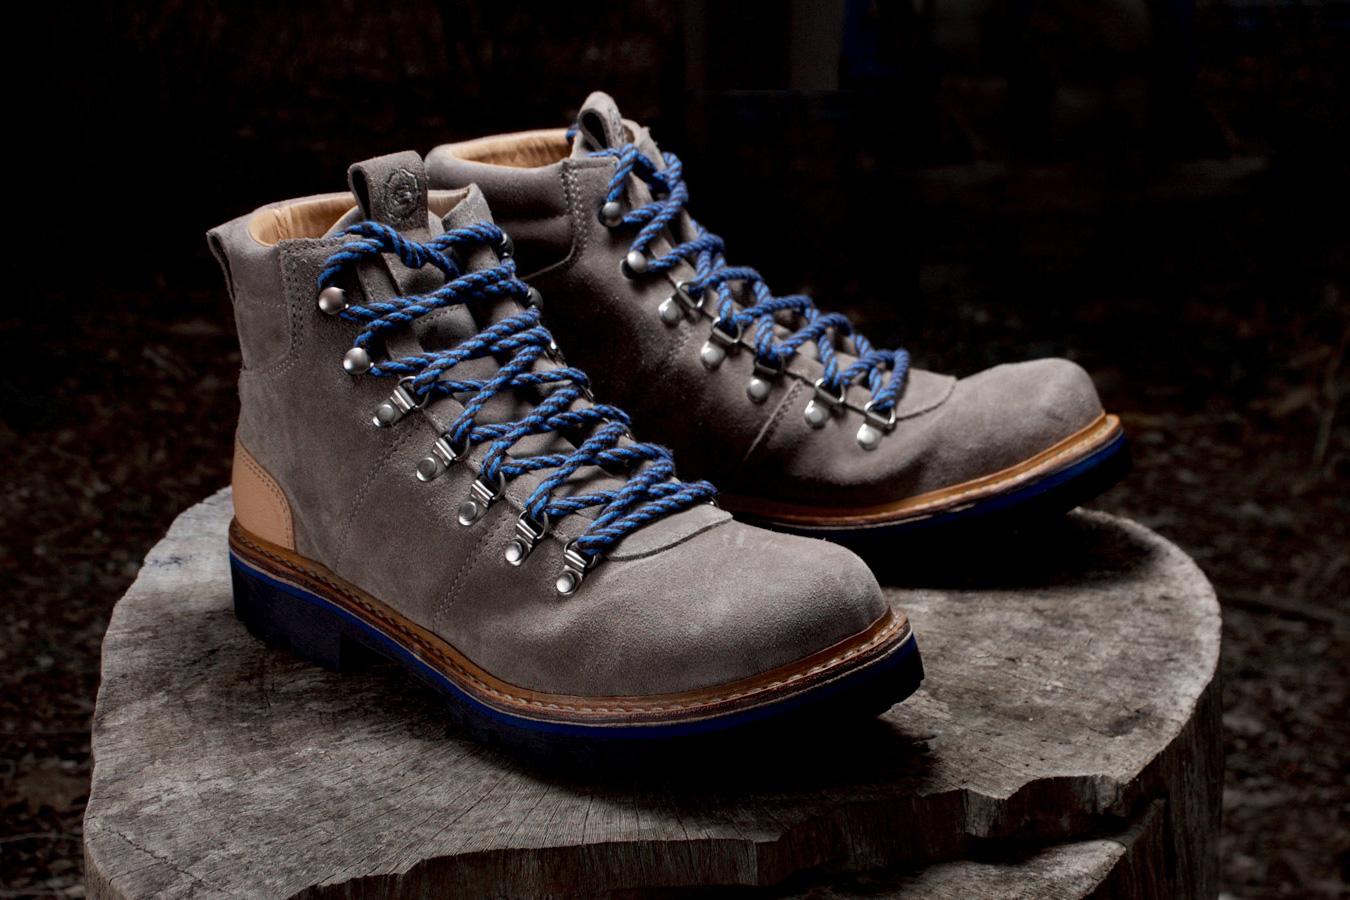 greats-amerigo-hiking-boot-01.jpg